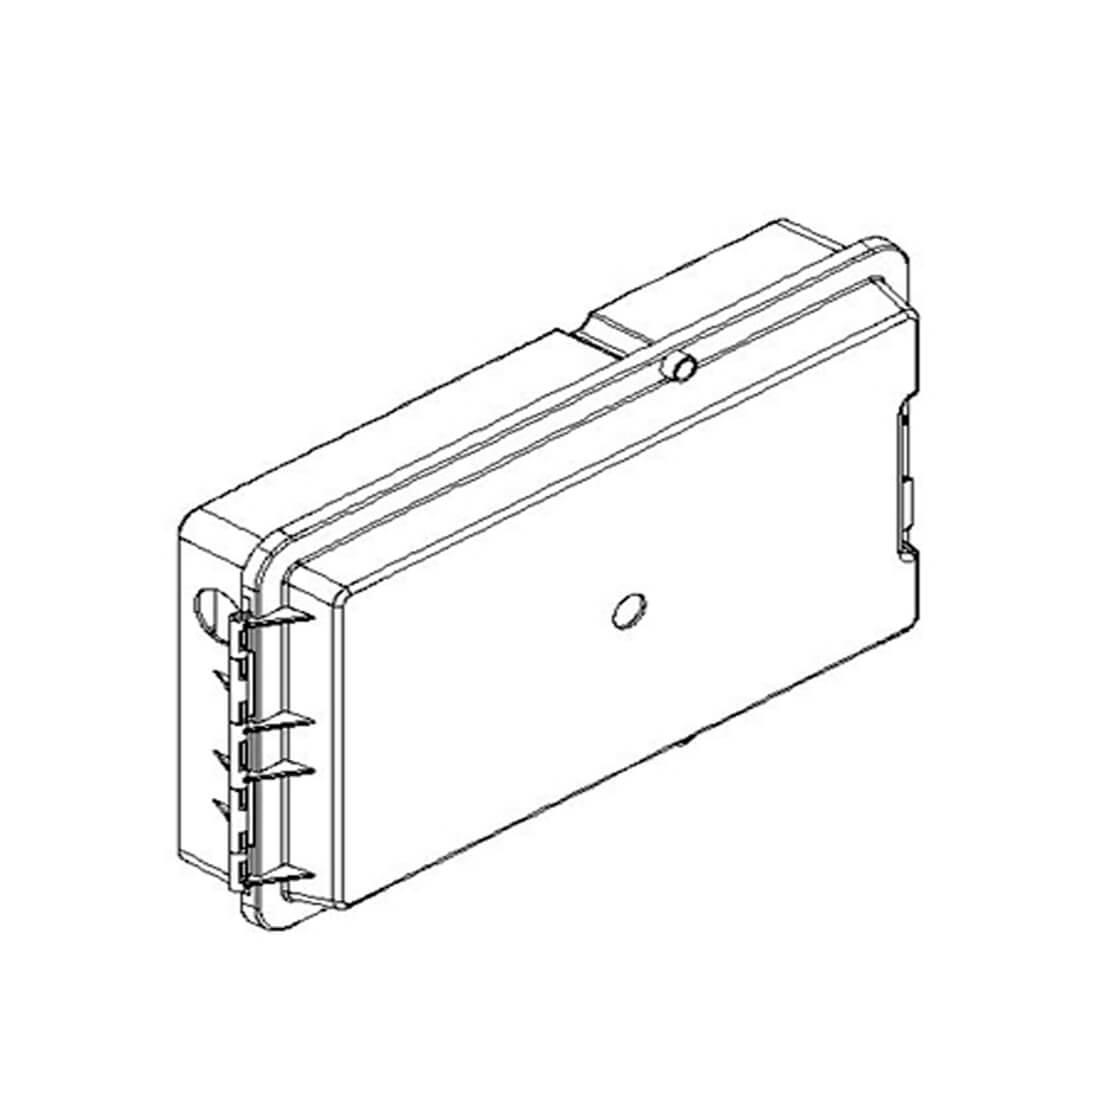 Smart Single Phase Meter Box